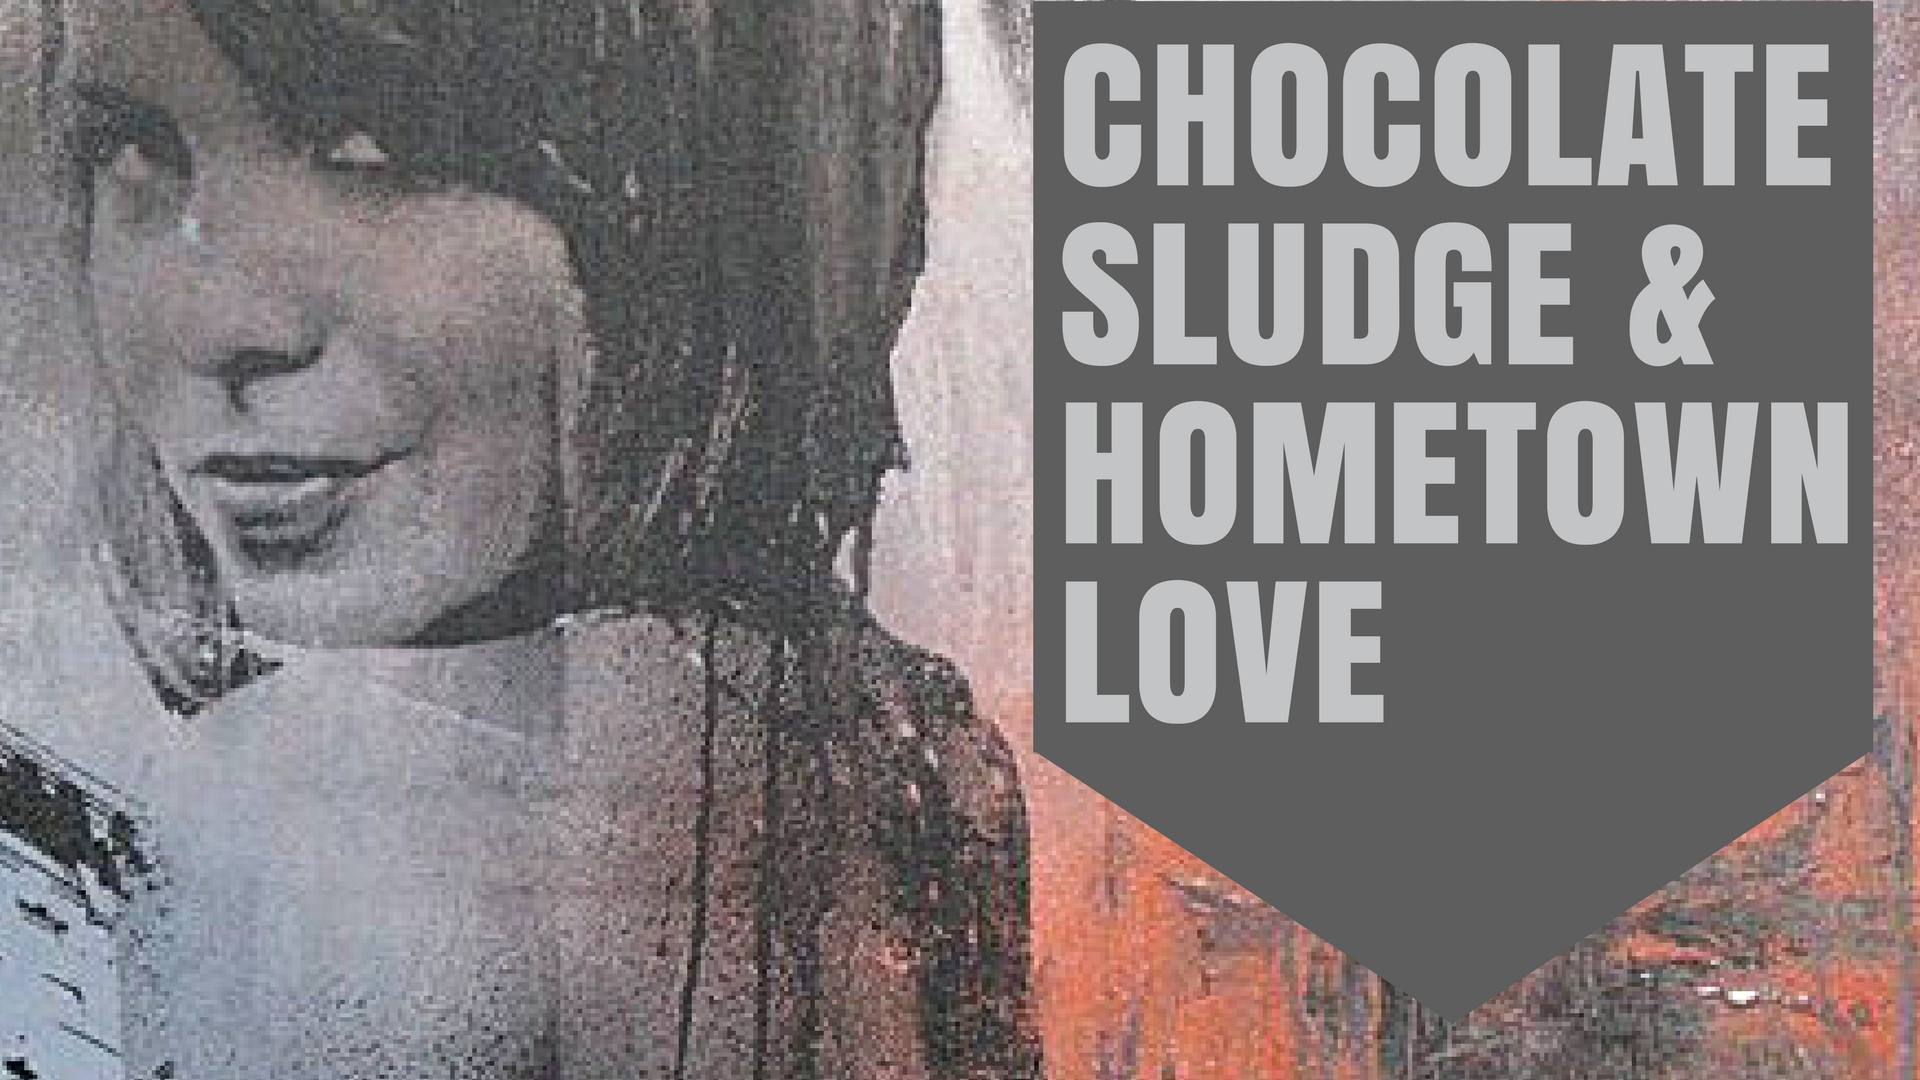 ChocolateSludge.jpg